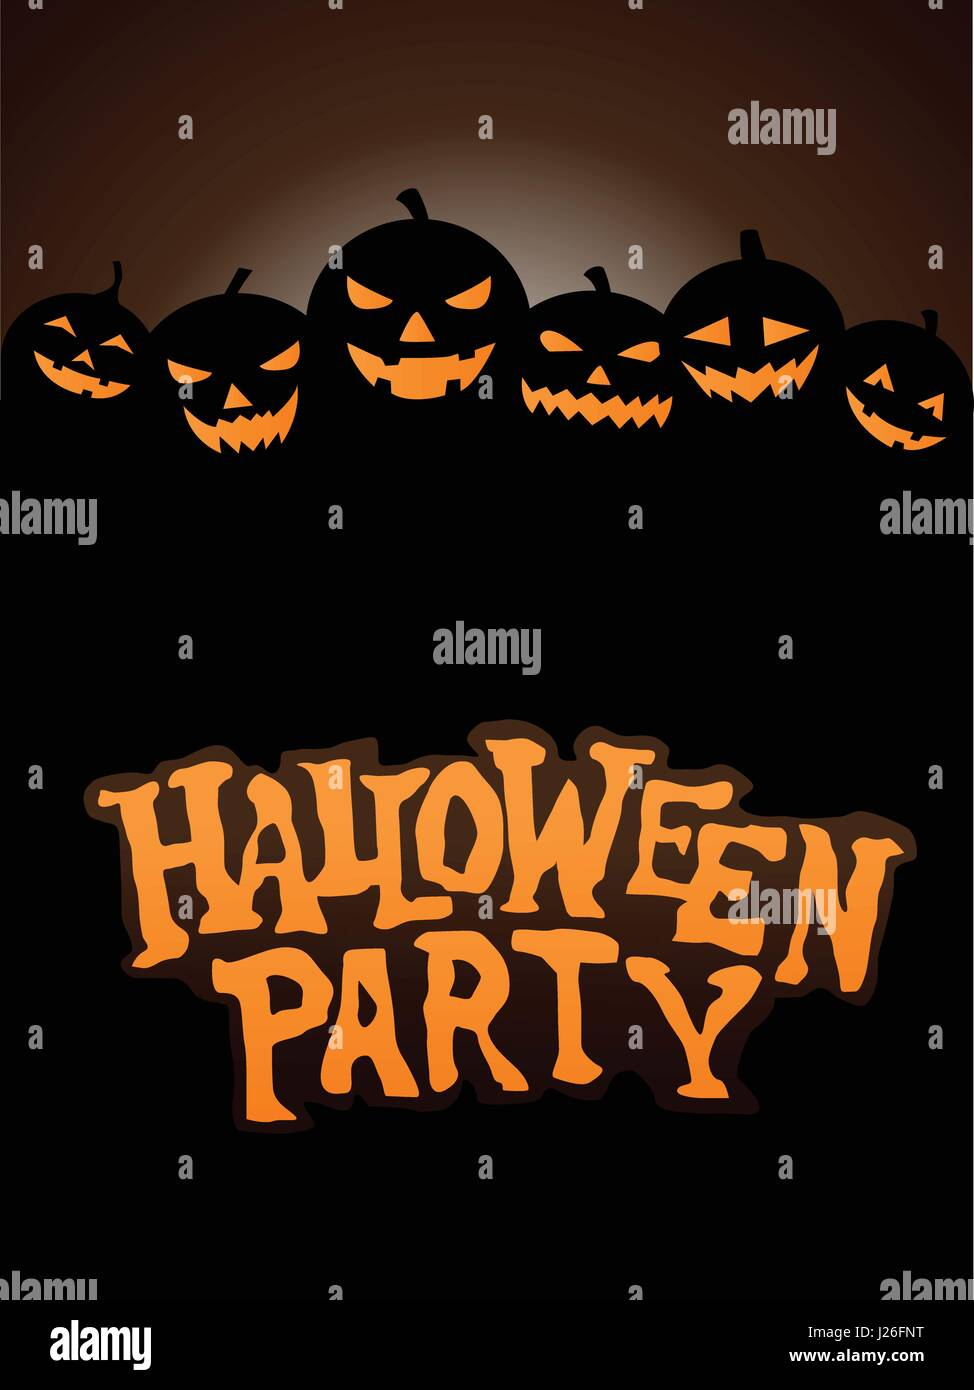 Halloween Party Background with Pumpkins Stock Vector Art ...